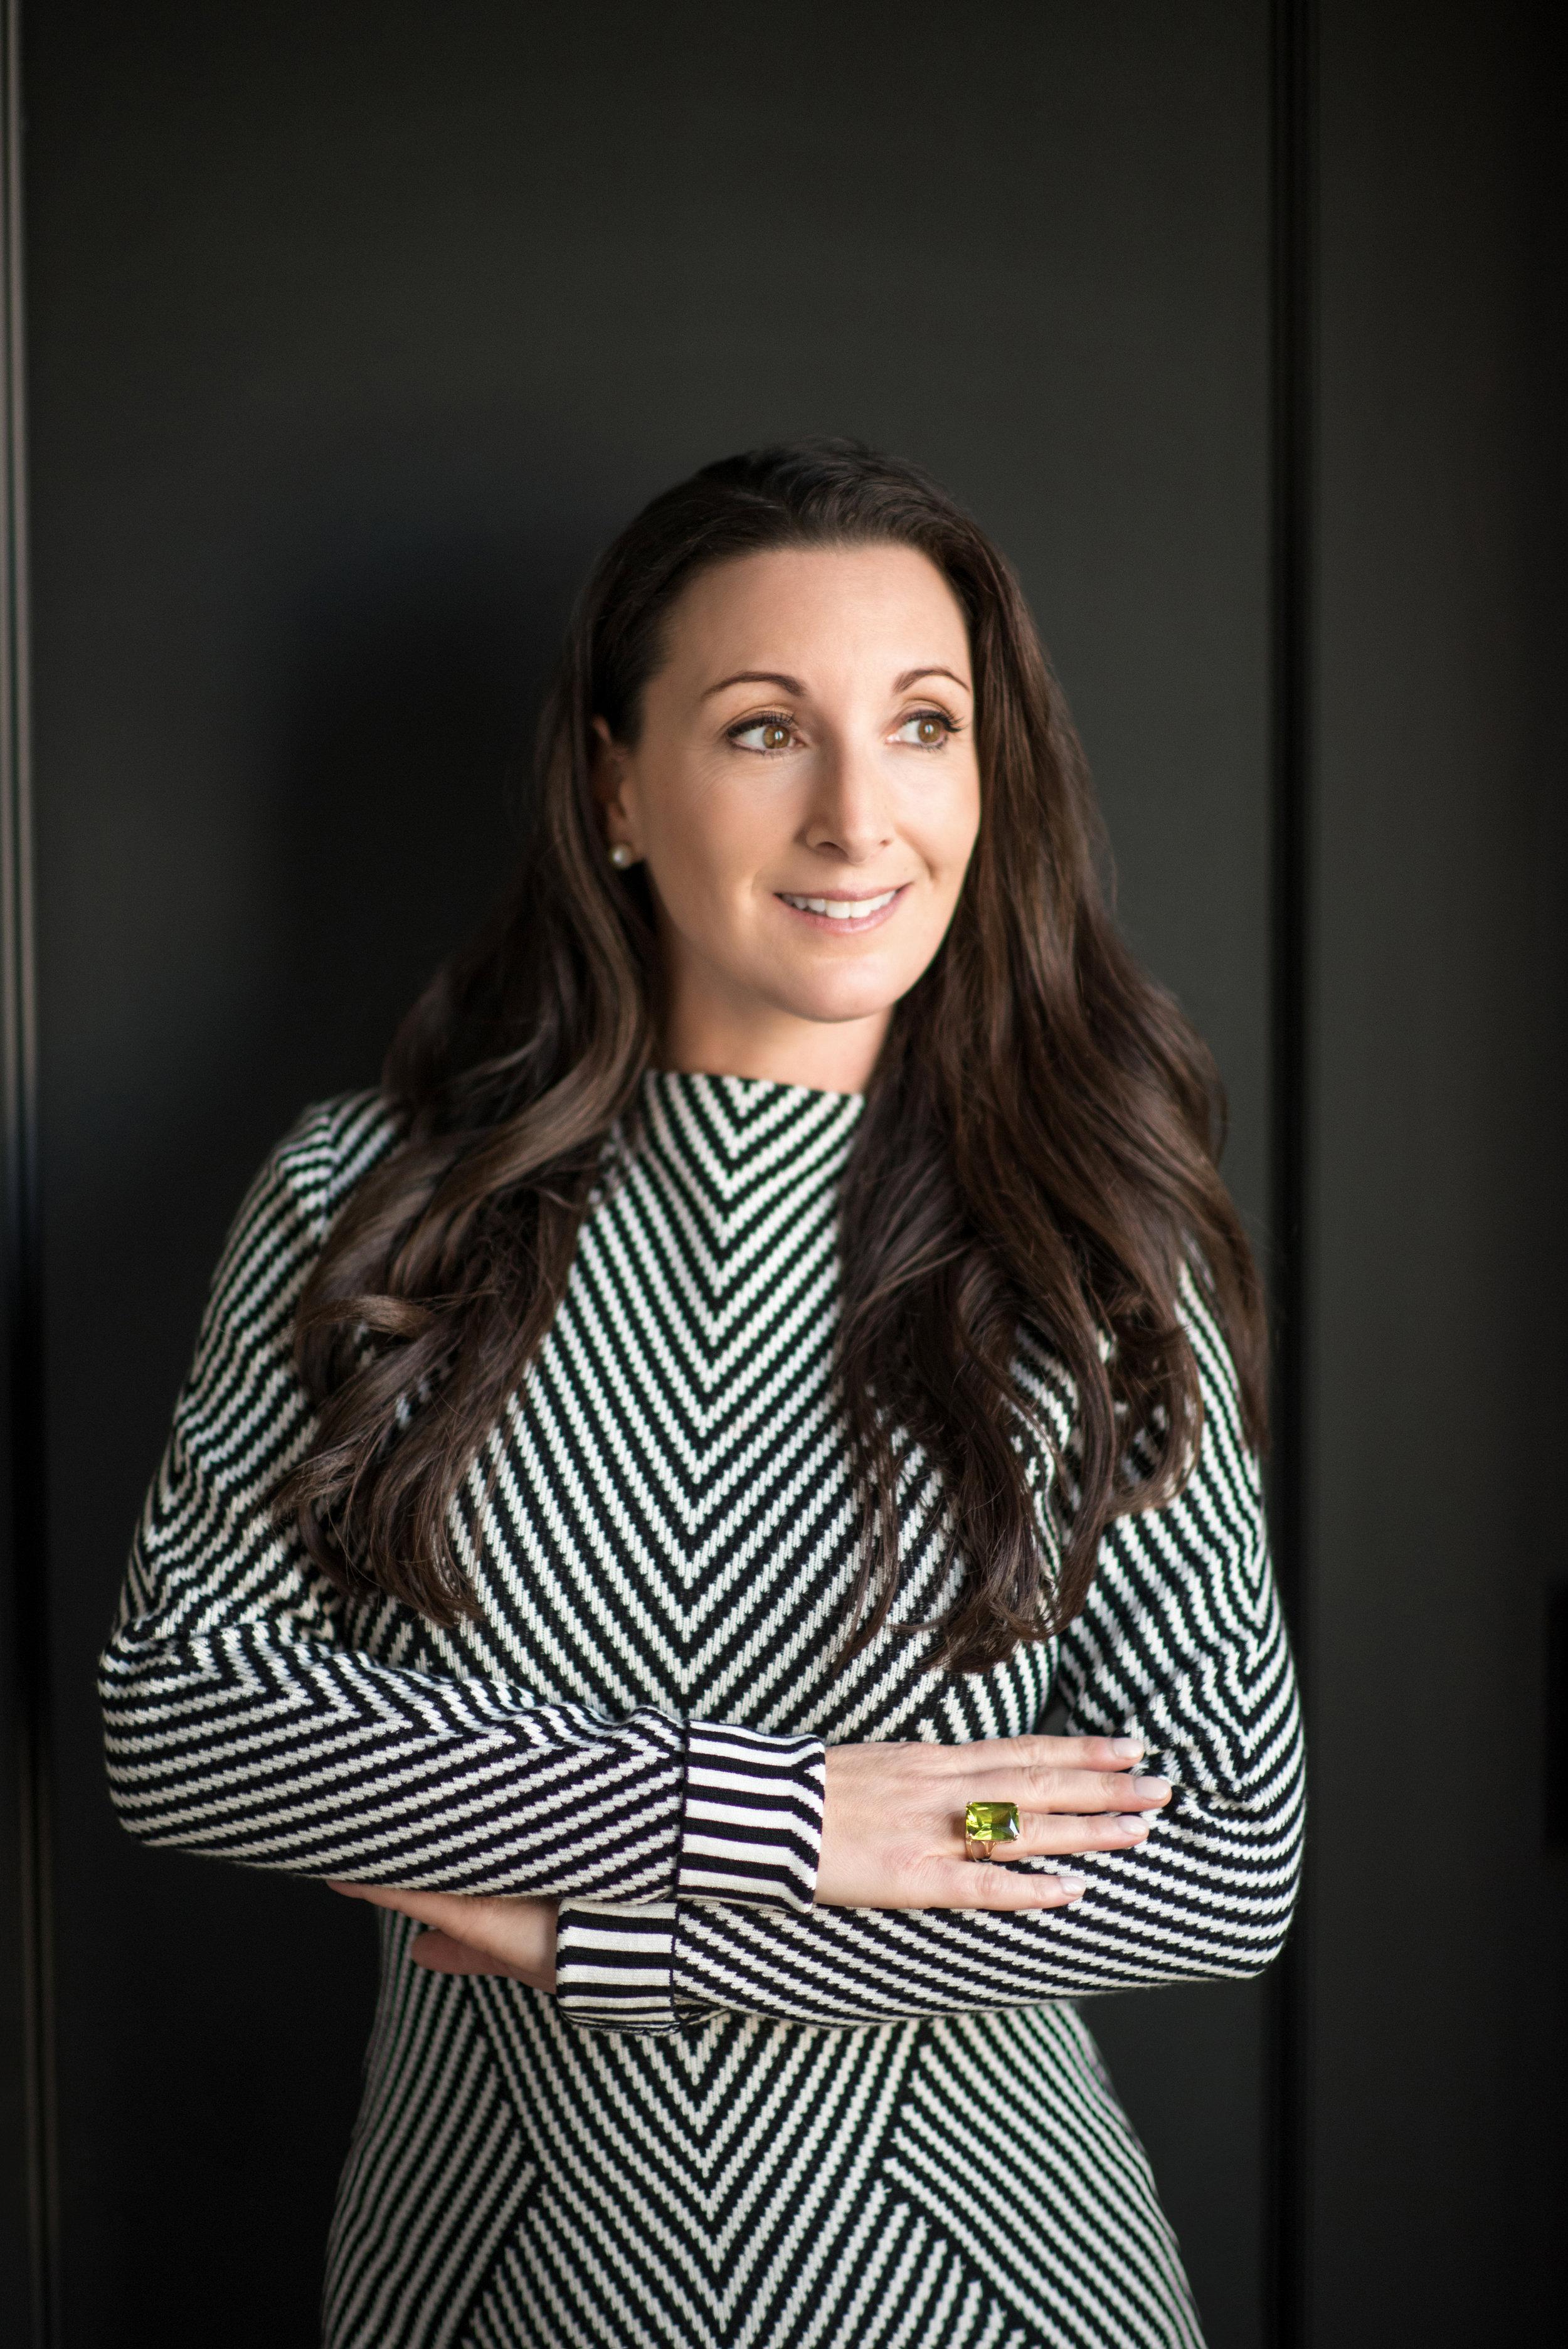 LIZA GERSHMAN - Liza Gershman Creative Agency, Founder